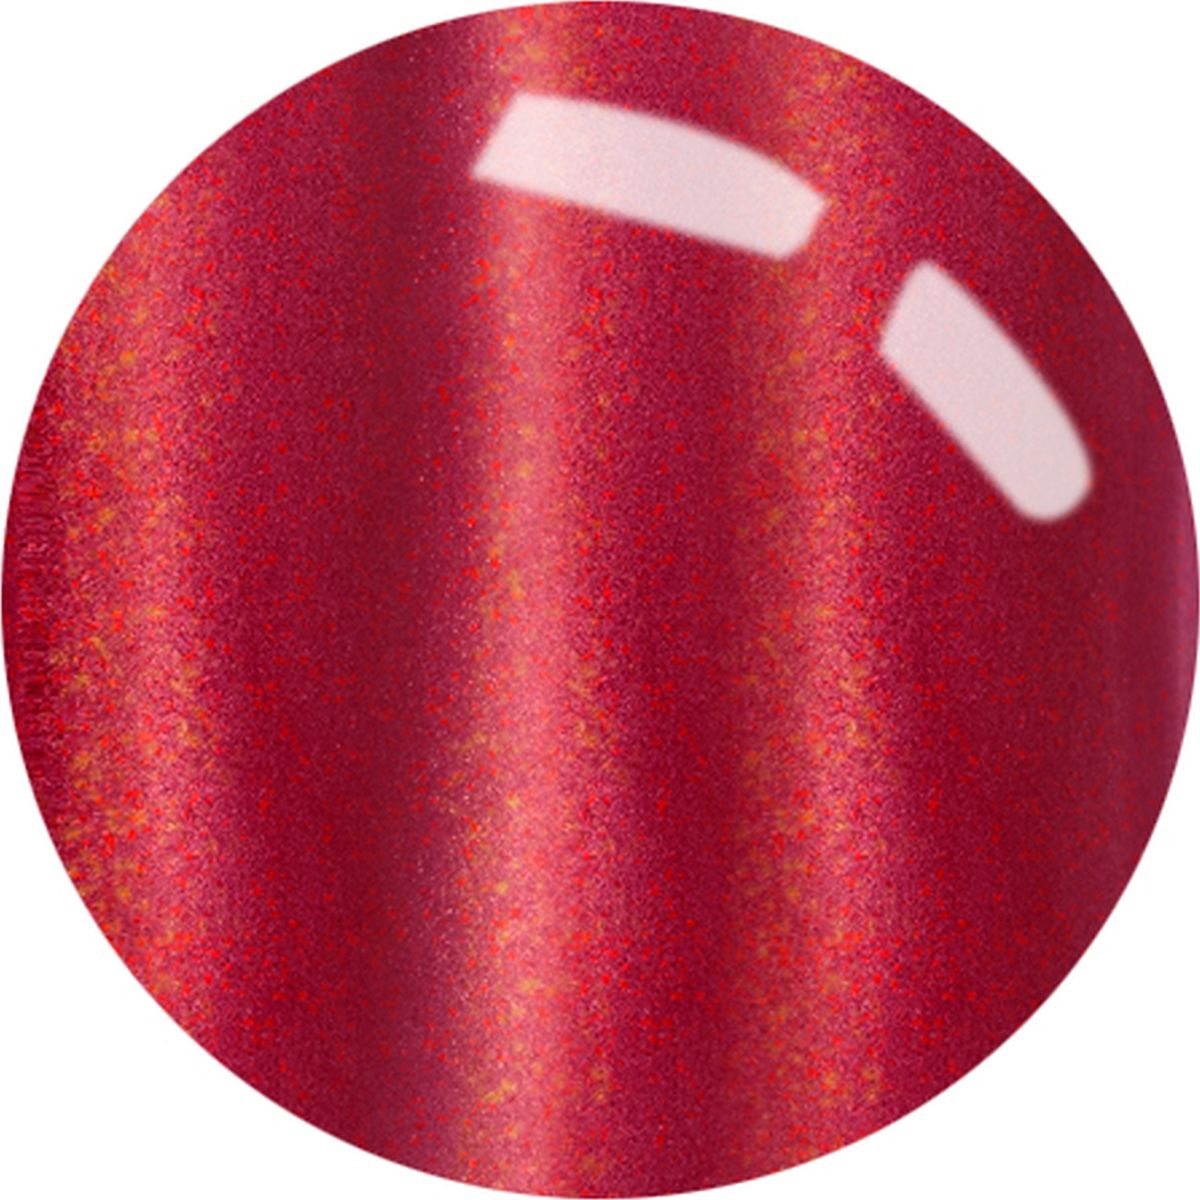 EssieЛак для ногтей, Зимняя коллекция 2017, Оттенок 523, Rring In The Bling 13,5 мл Essie